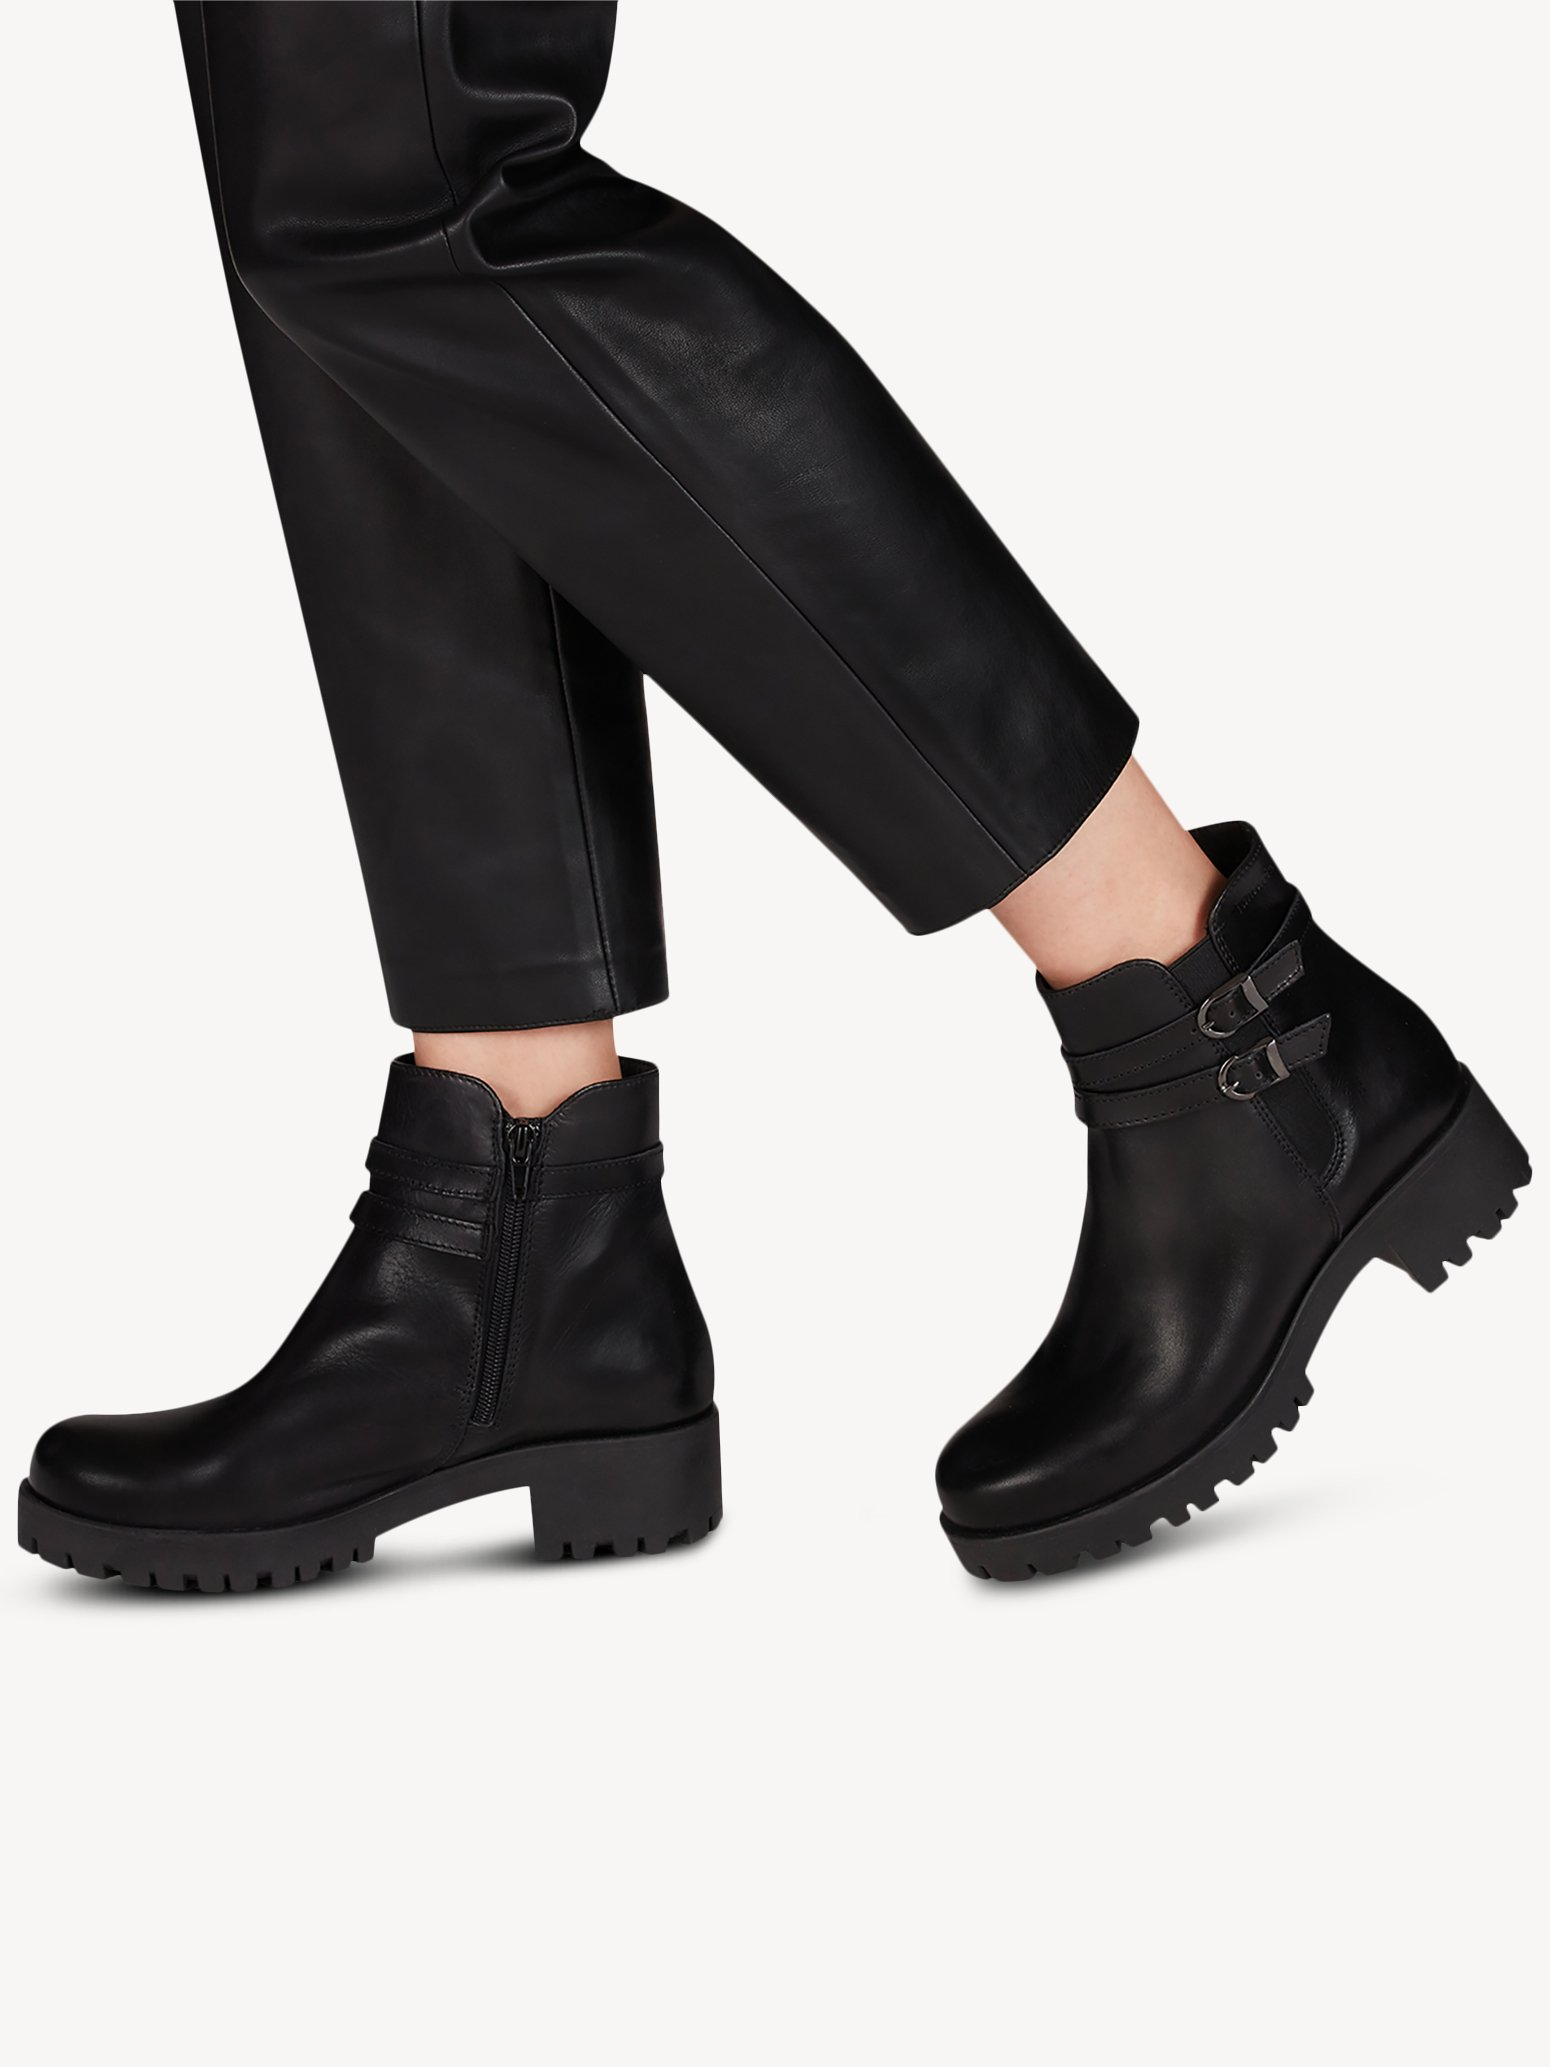 Ботинки Tamaris 1-1-25477-25-001